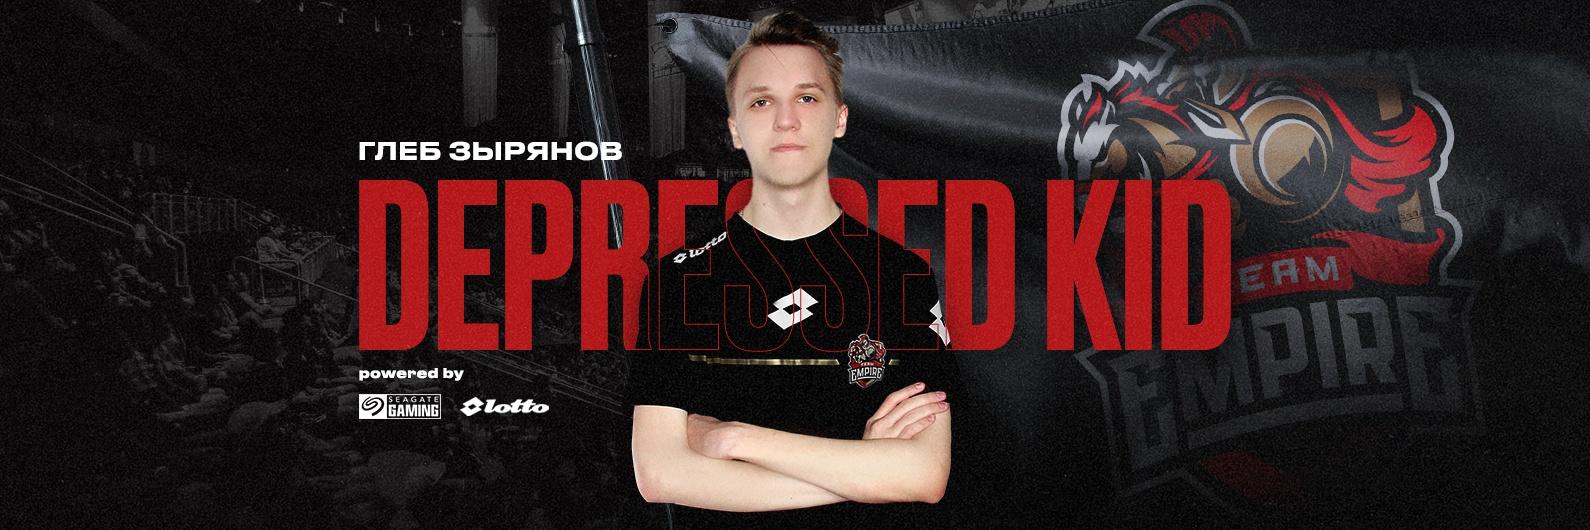 depressed kid fan club (official)   ВКонтакте